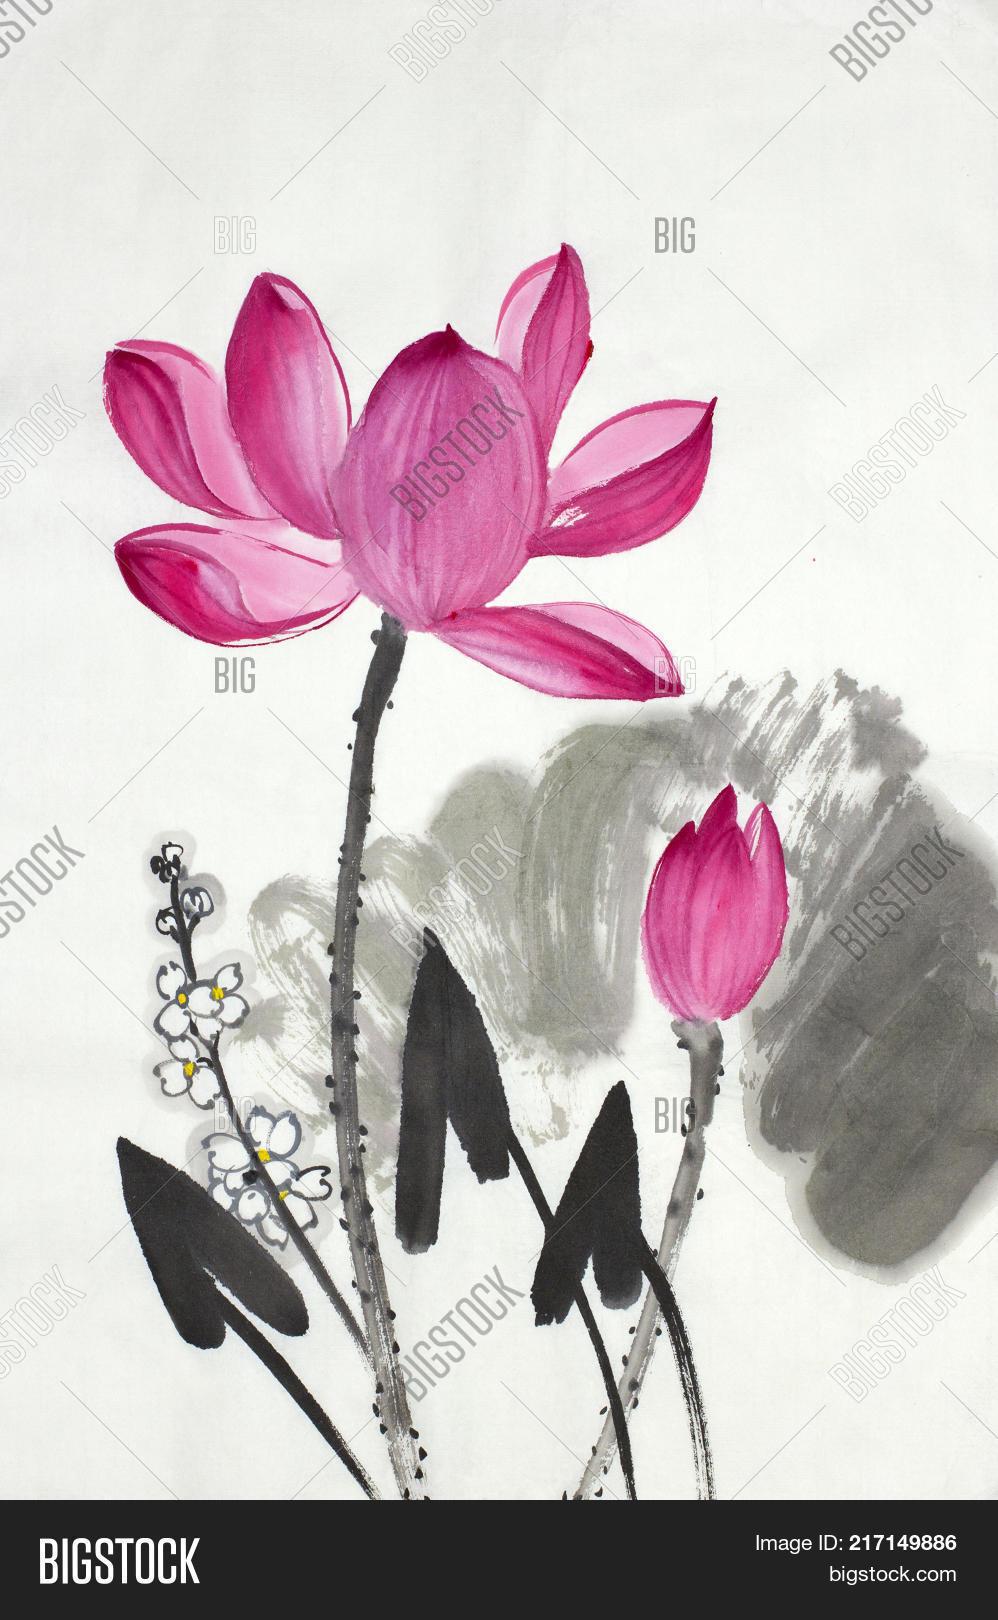 Lotus Flower Arrow Image Photo Free Trial Bigstock